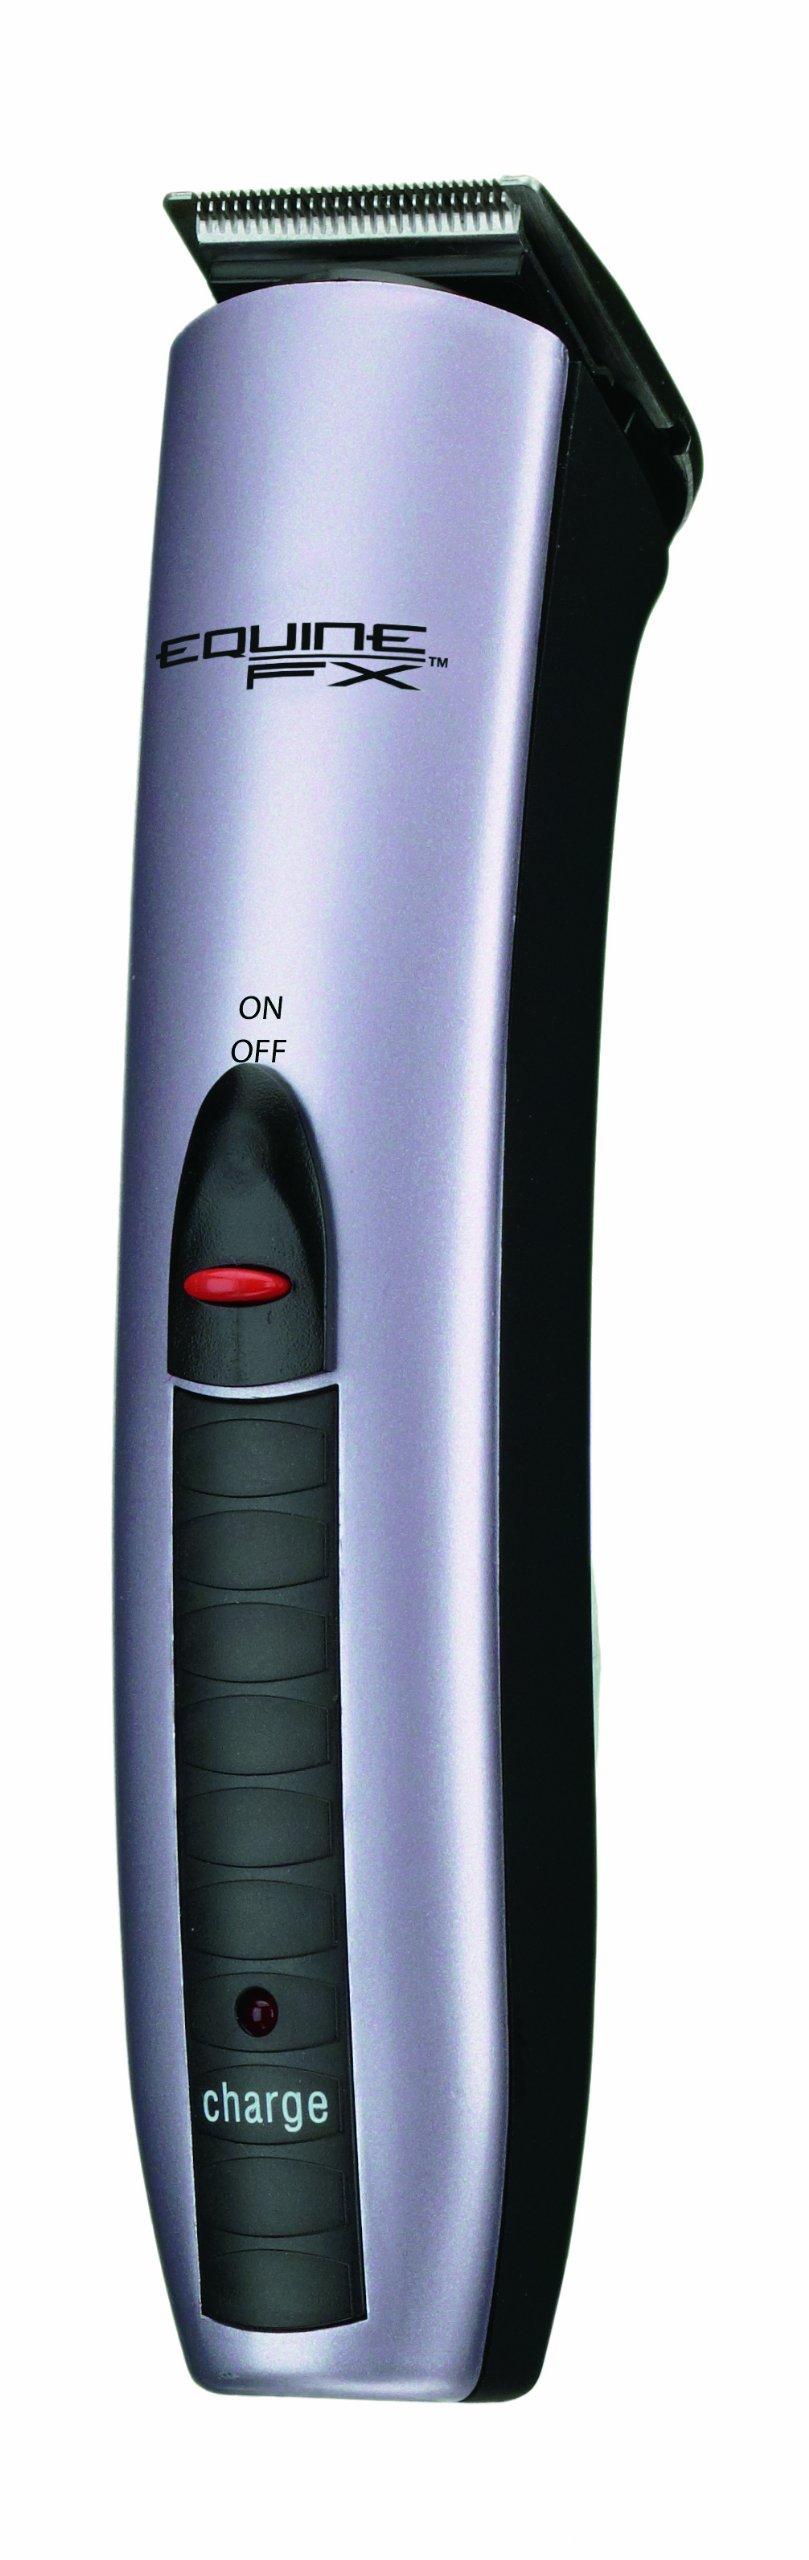 Conair Equine FX Flexi-Groom Professional Cord/Cordless Trimmer, Equine Professional Grooming, Pearled Lavender